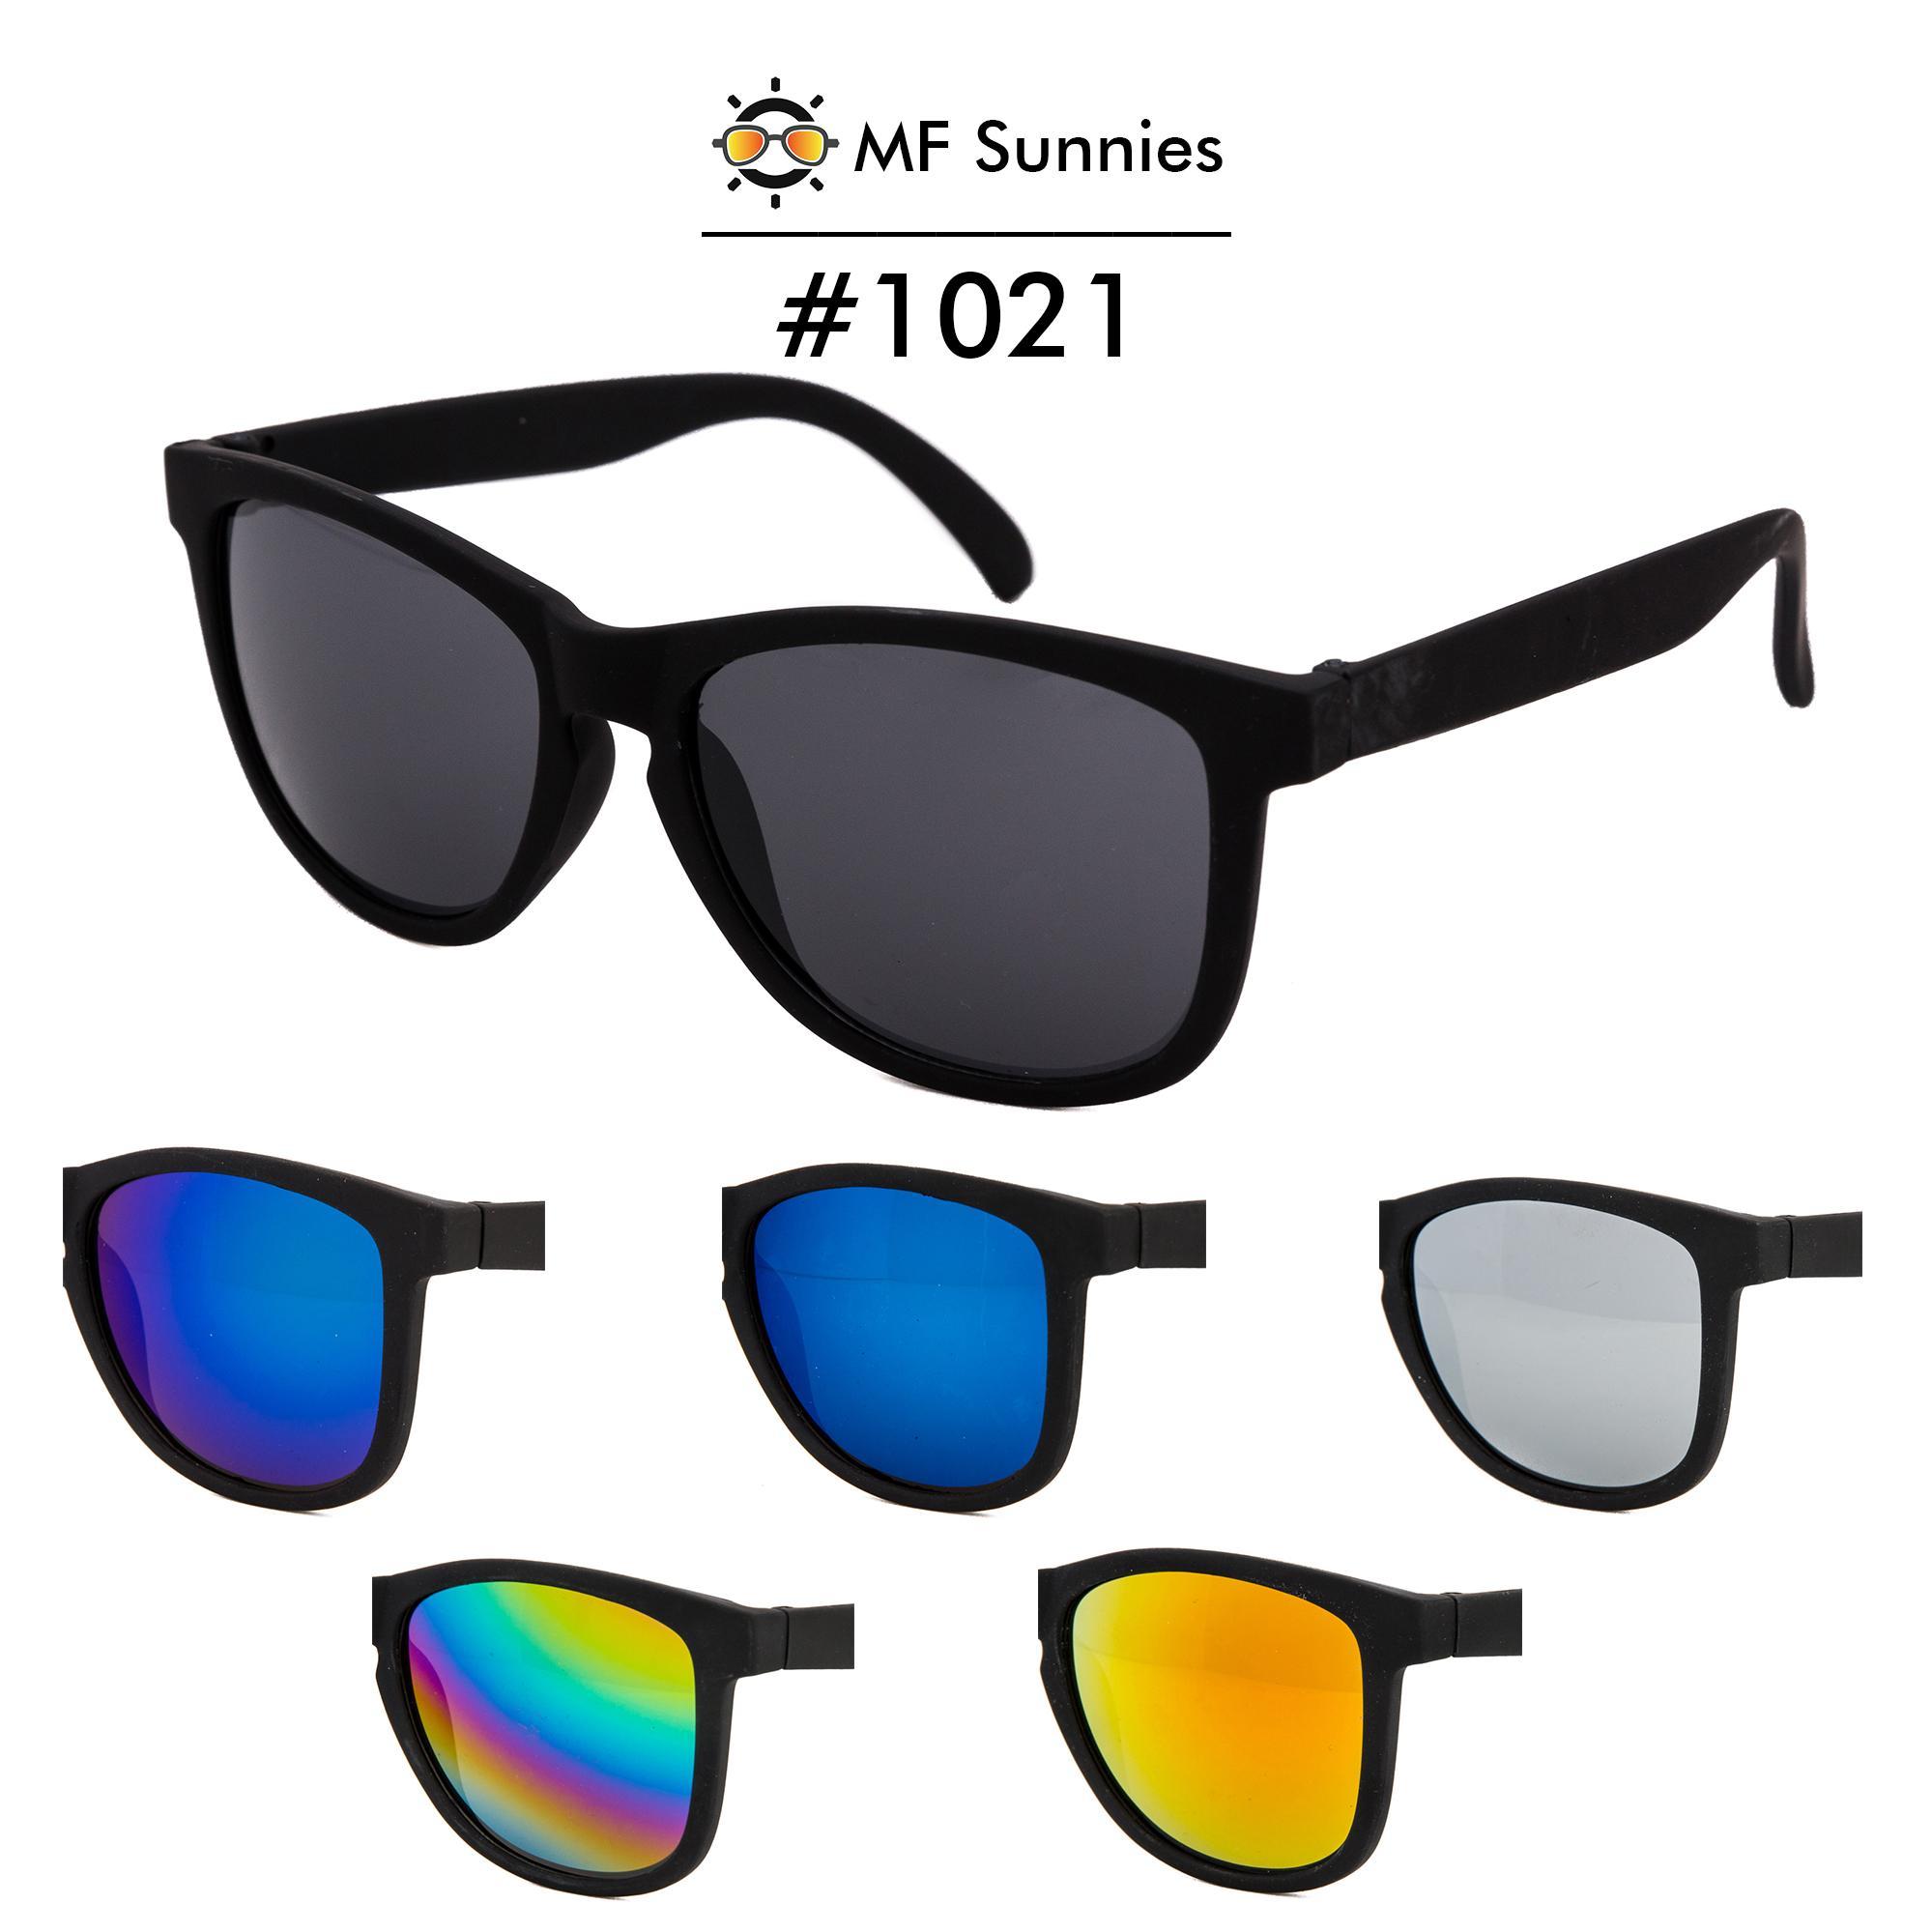 d72cd6ed2b8a0 Sunglasses For Women for sale - Womens Sunglasses online brands ...